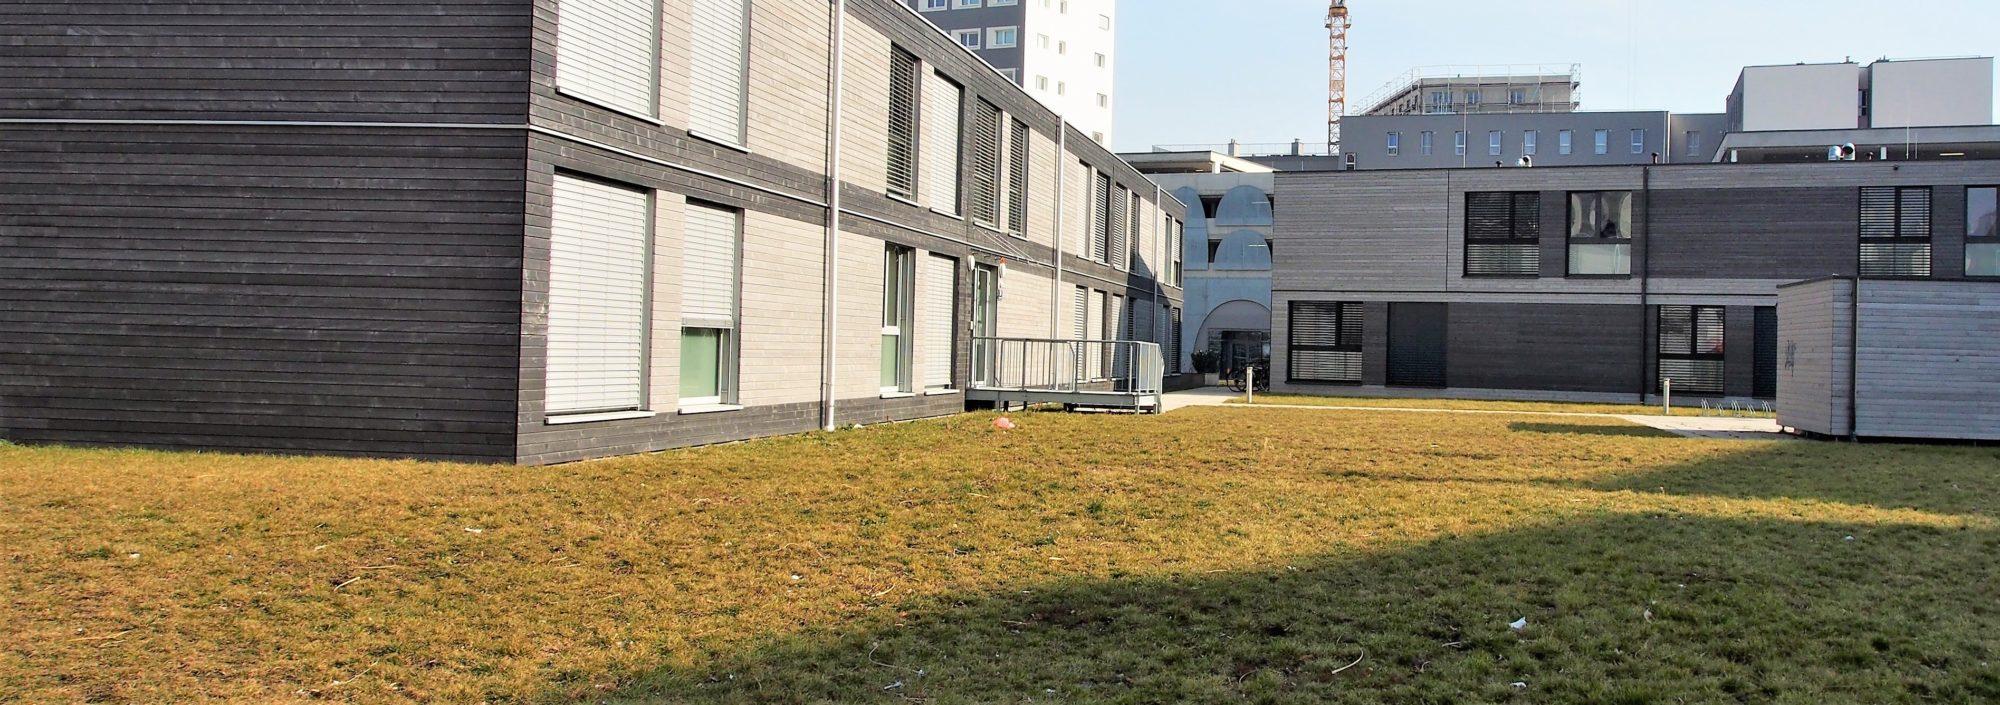 pop-up housing environments